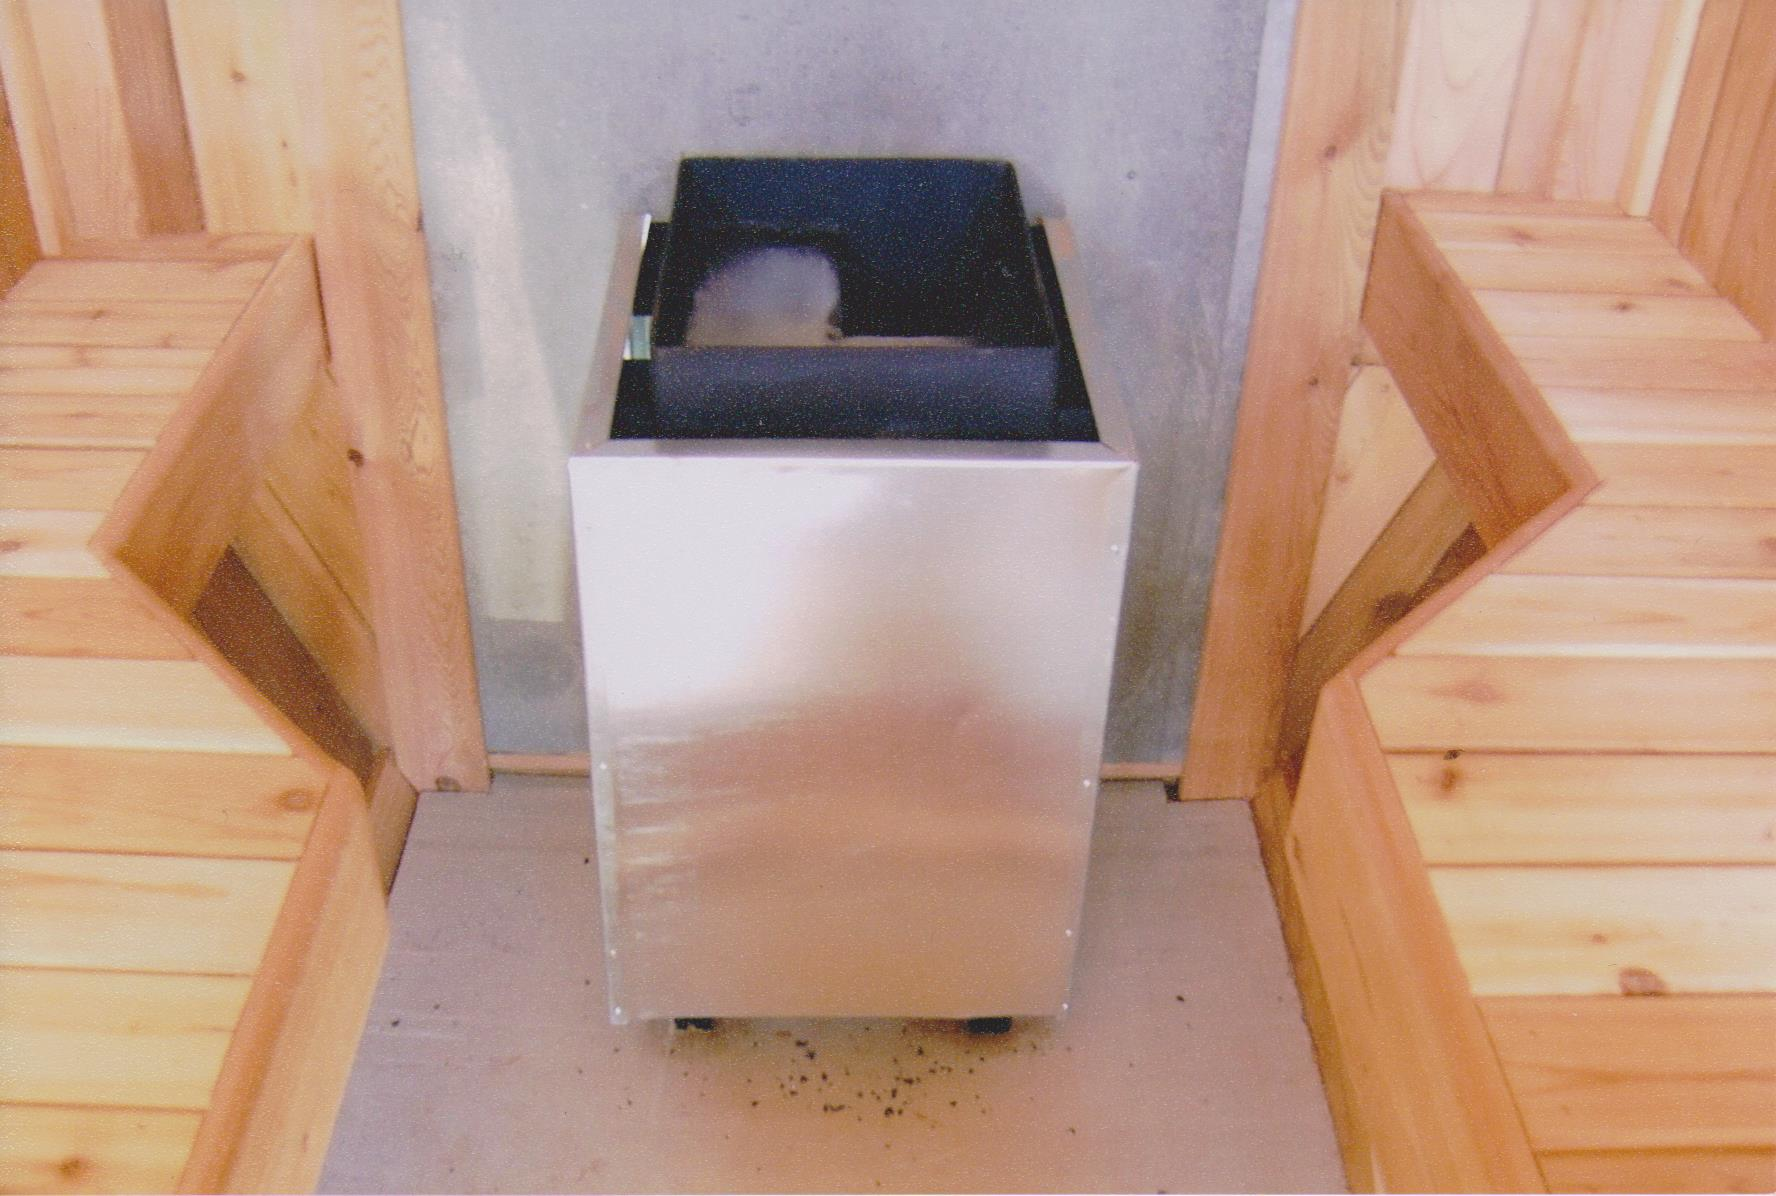 Affordable Sauna Project Dreamsauna Dreamsauna